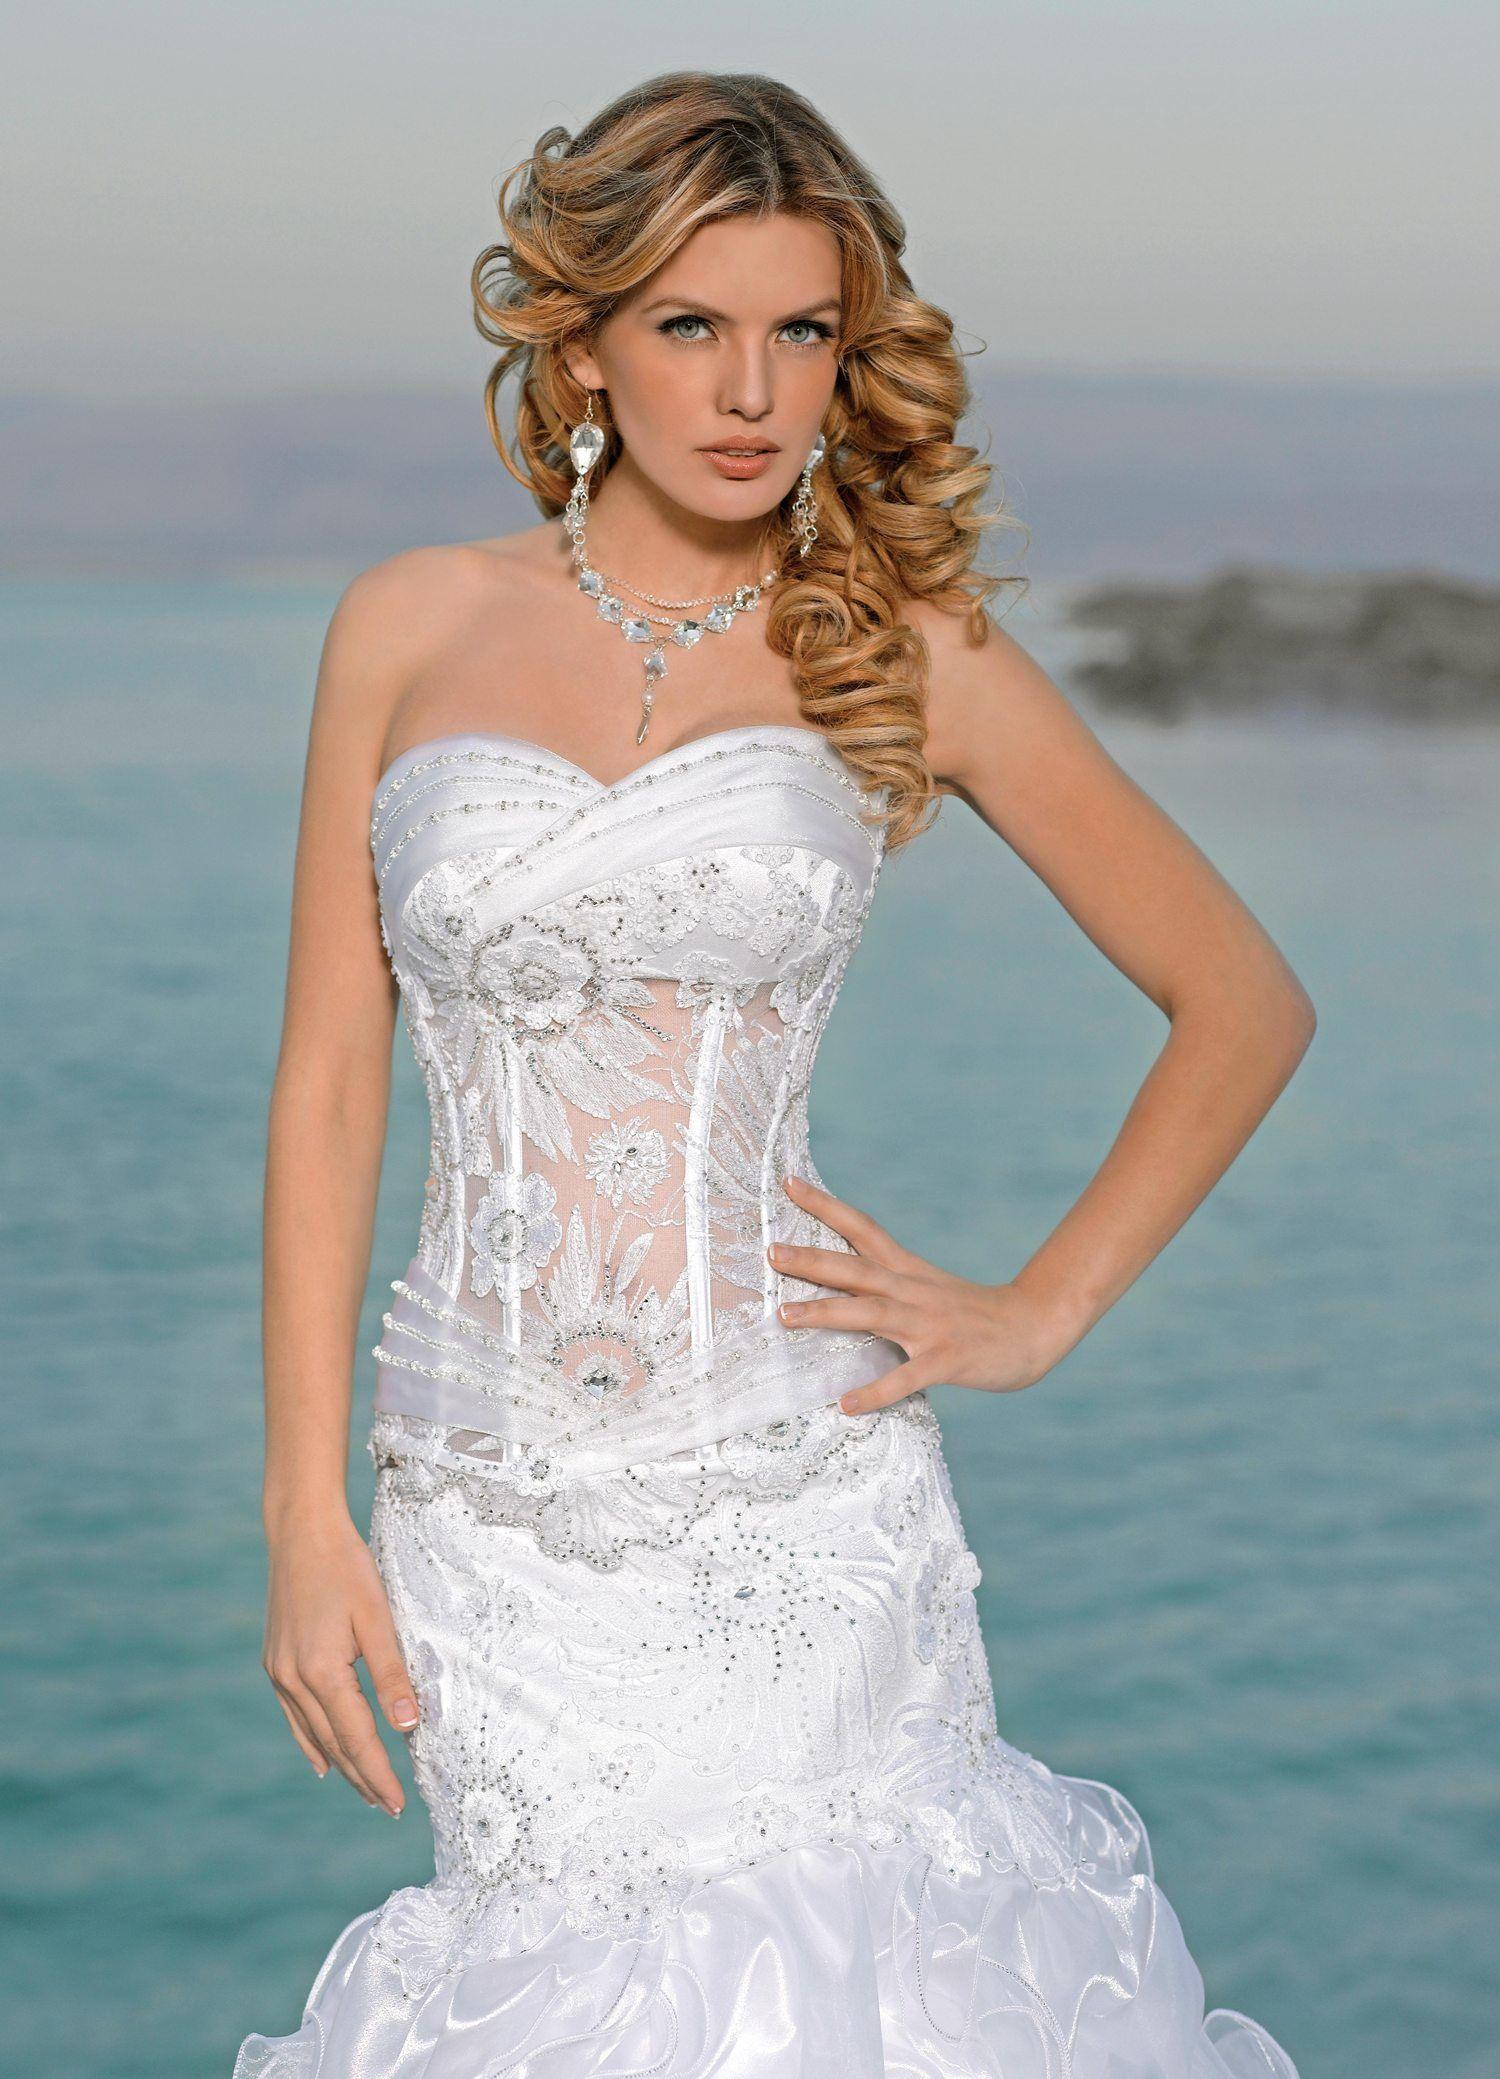 BRIDAL DRESS BY MY LADY LADY SABRA - LADY SABRA SKIRT - LADY OLYMPIA ...